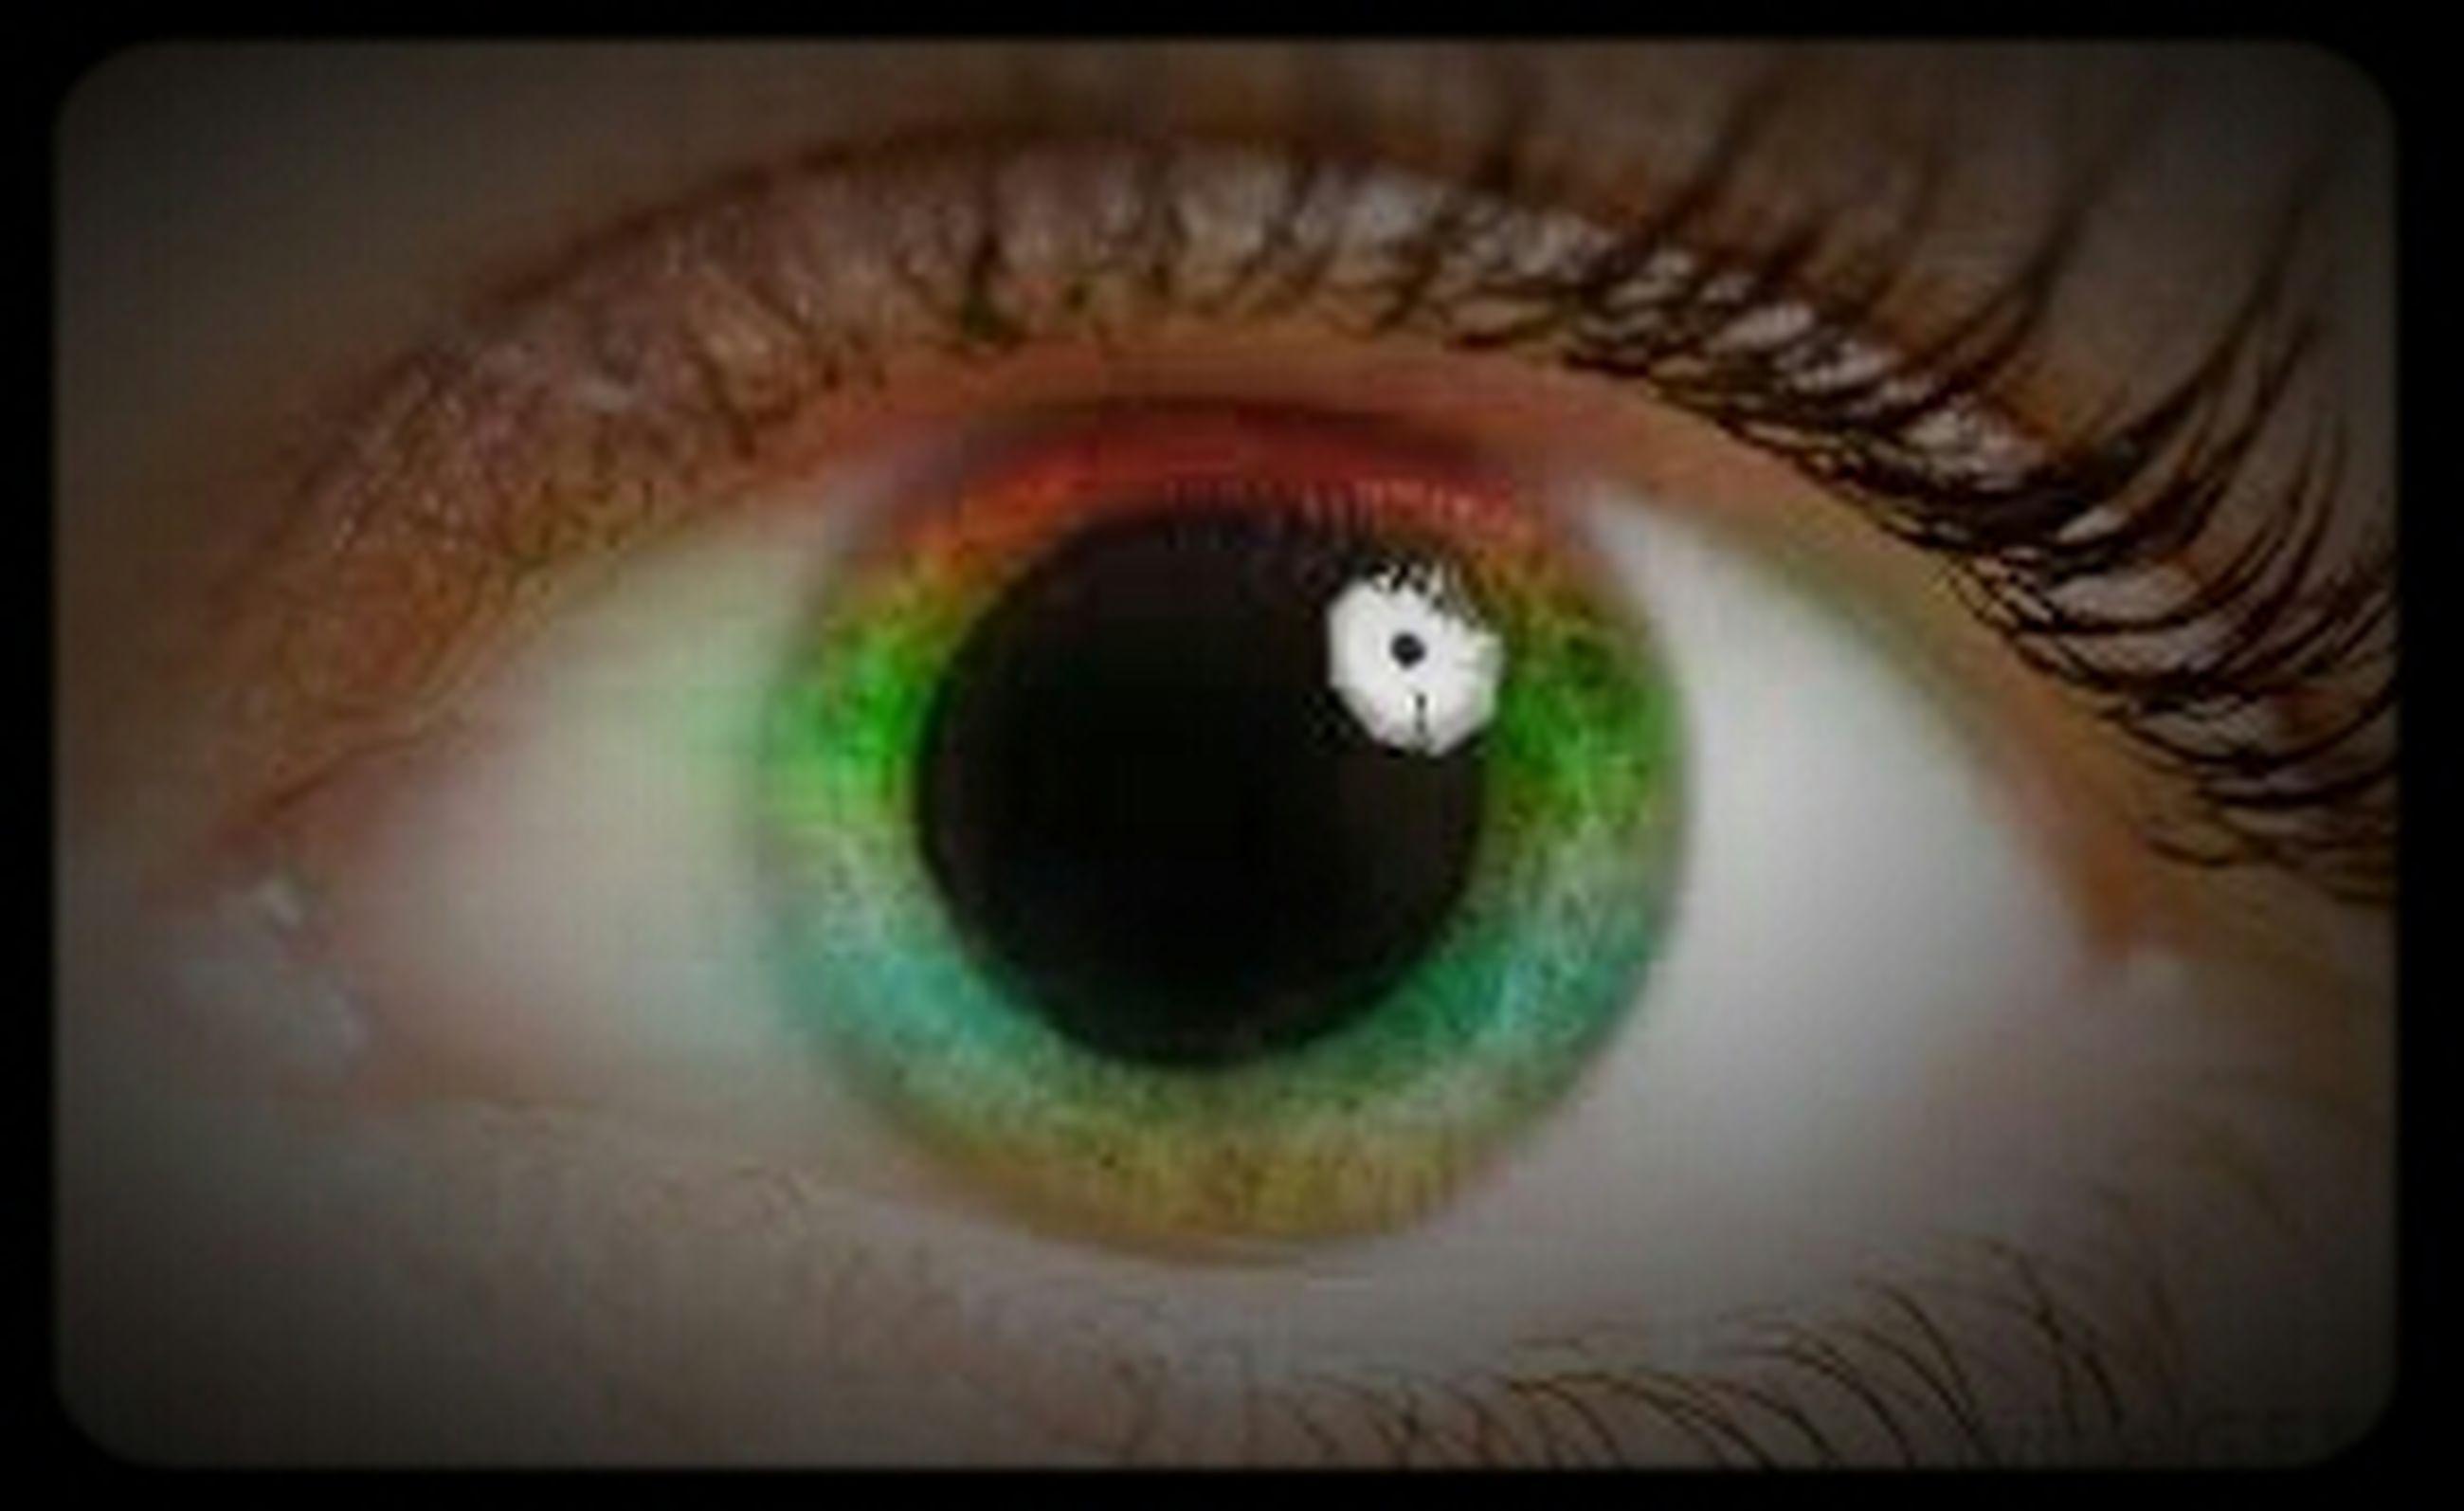 human eye, eyelash, close-up, eyesight, sensory perception, indoors, eyeball, part of, extreme close-up, portrait, iris - eye, looking at camera, unrecognizable person, human skin, auto post production filter, extreme close up, reflection